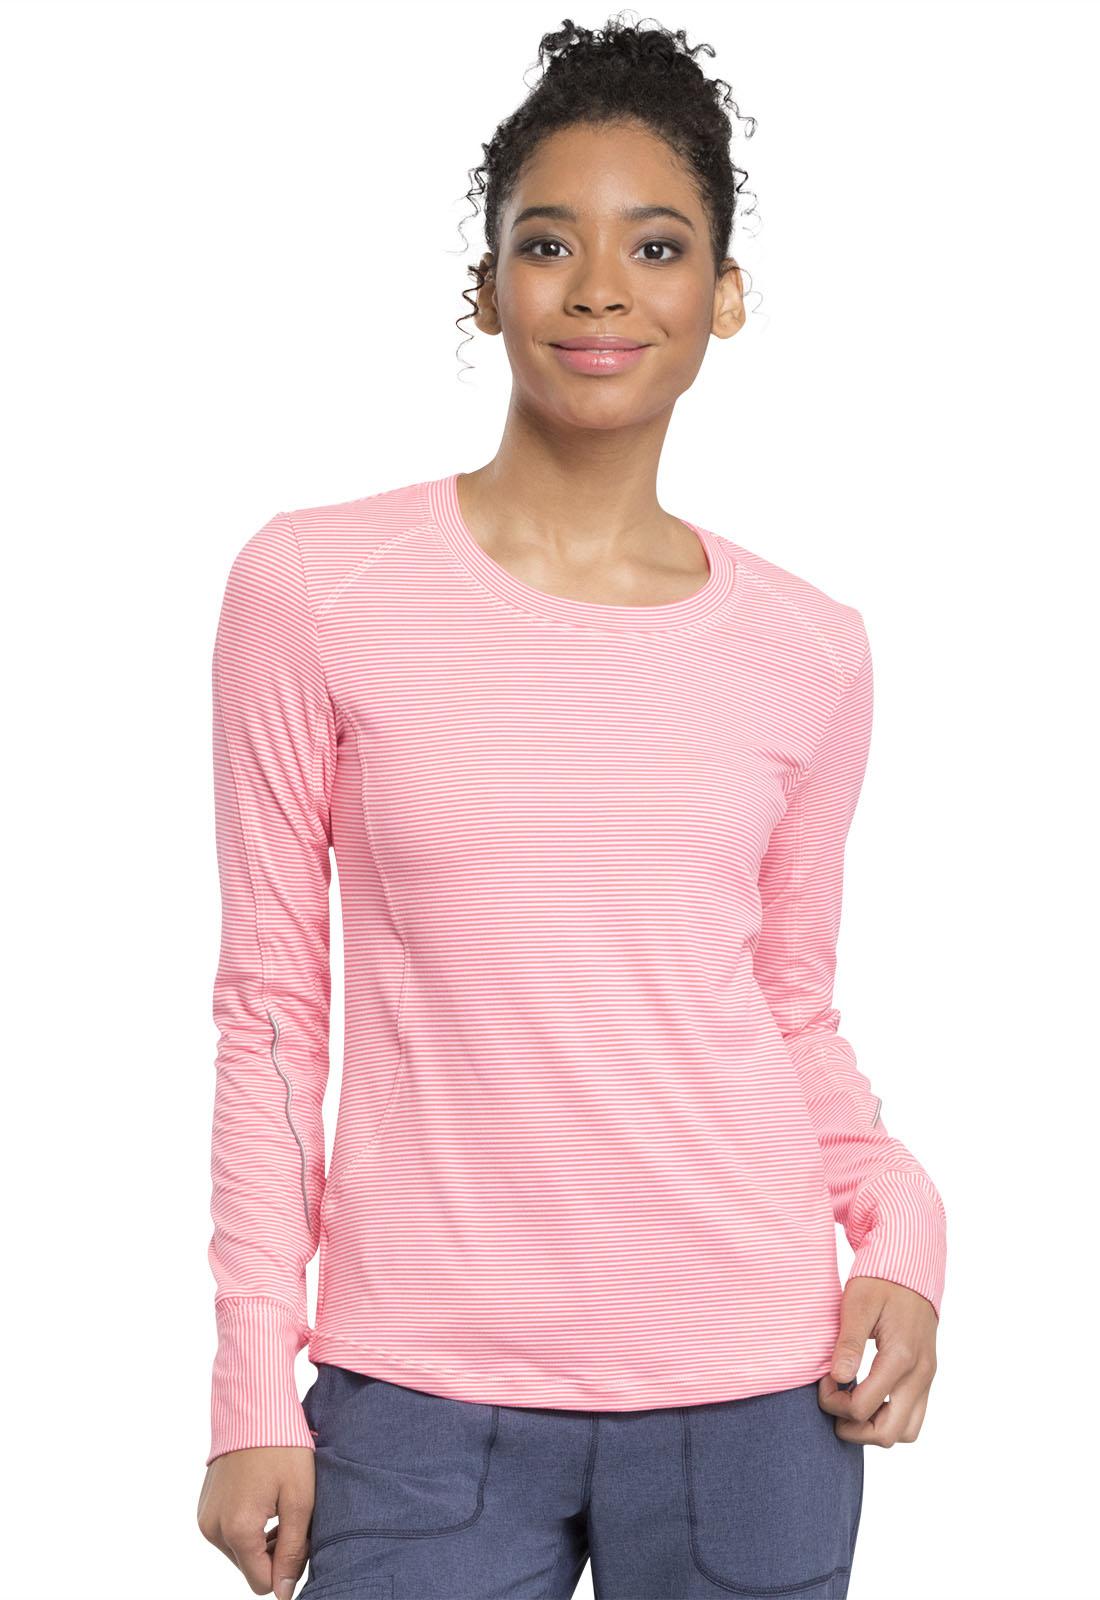 cc5bbdbe0d5 Infinity Long Sleeve Underscrub Knit Tee in Poppy Pink / White CK765 ...